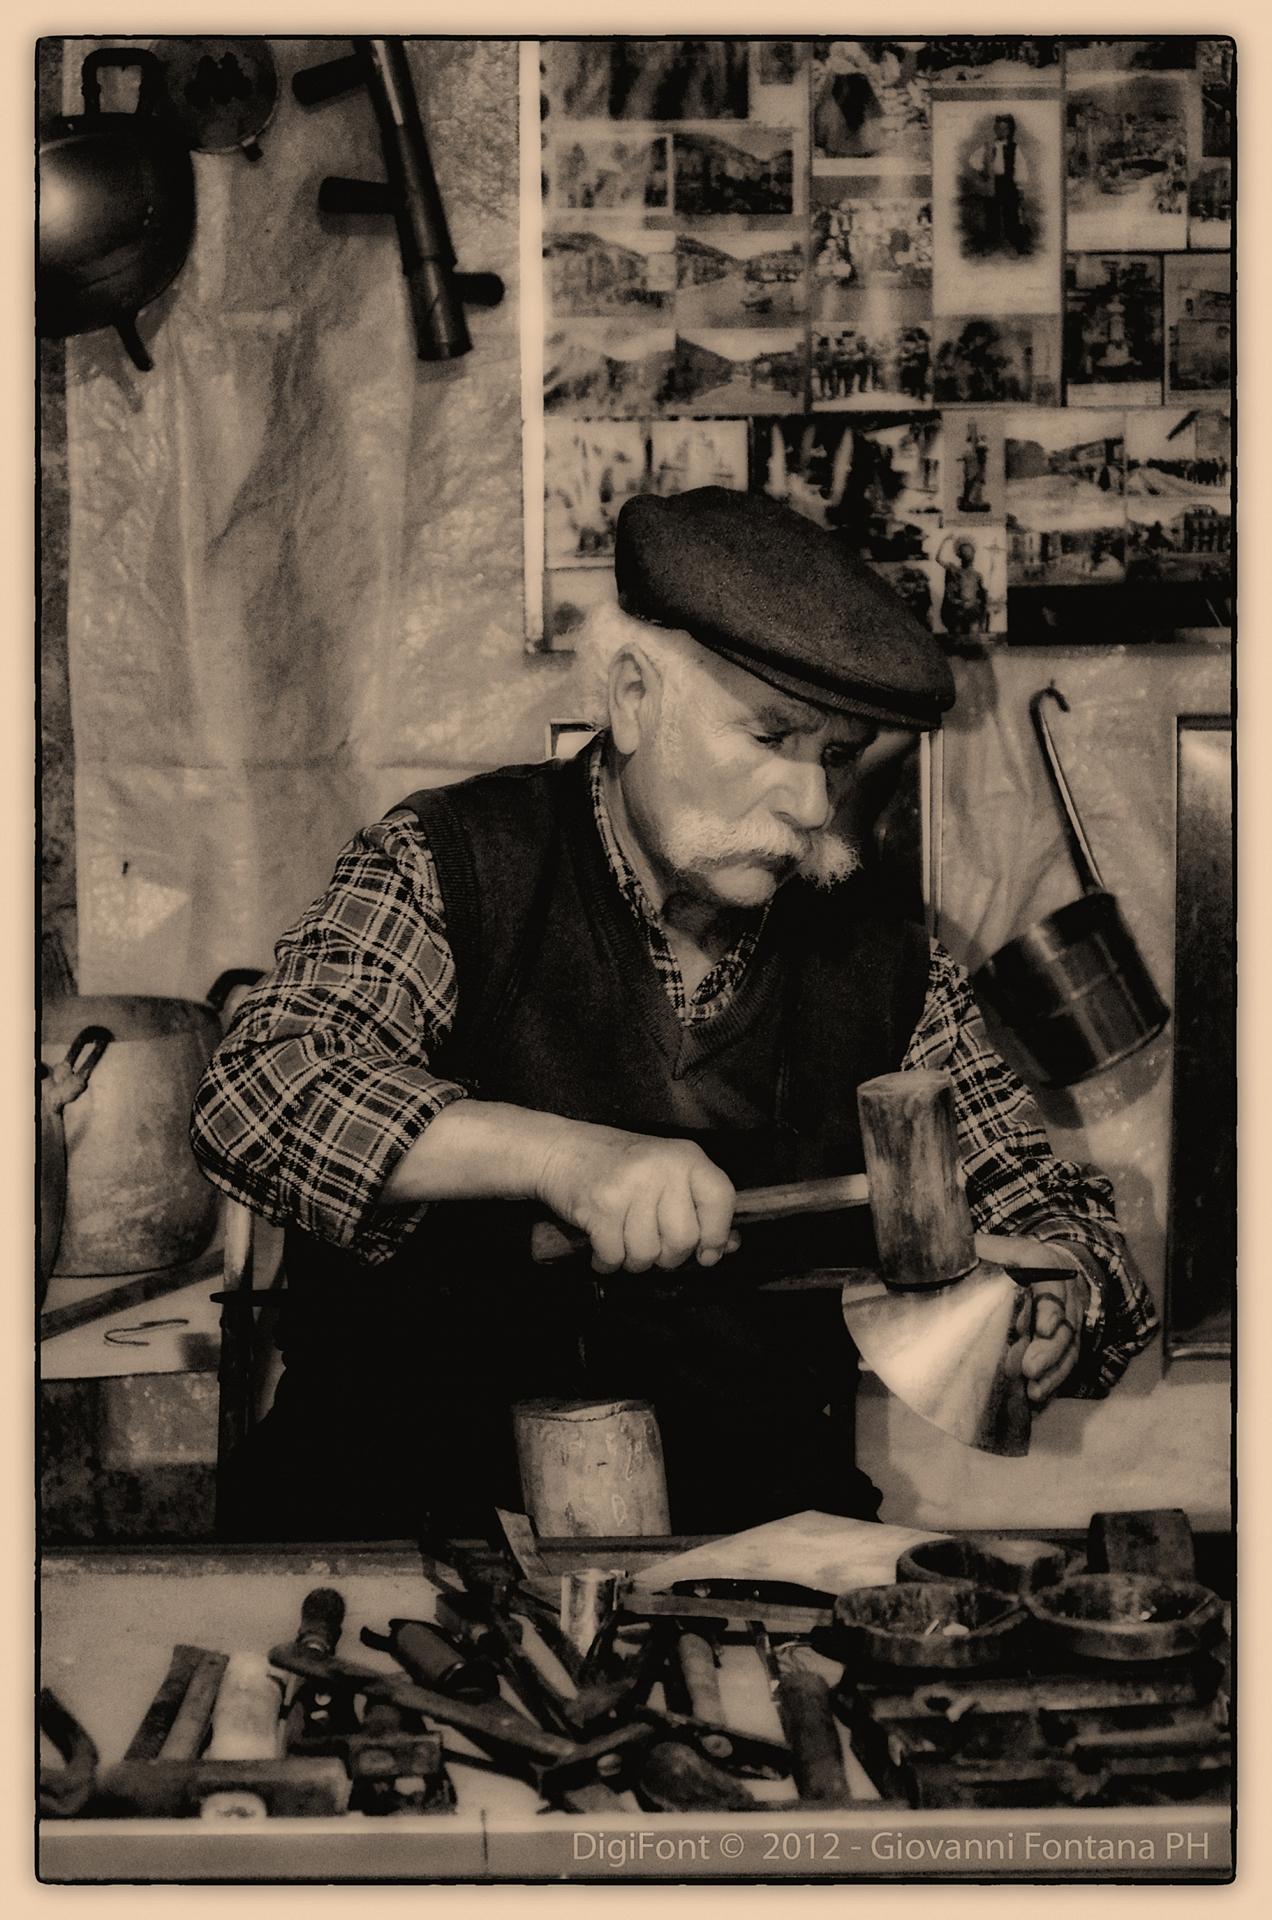 The tinsmith...